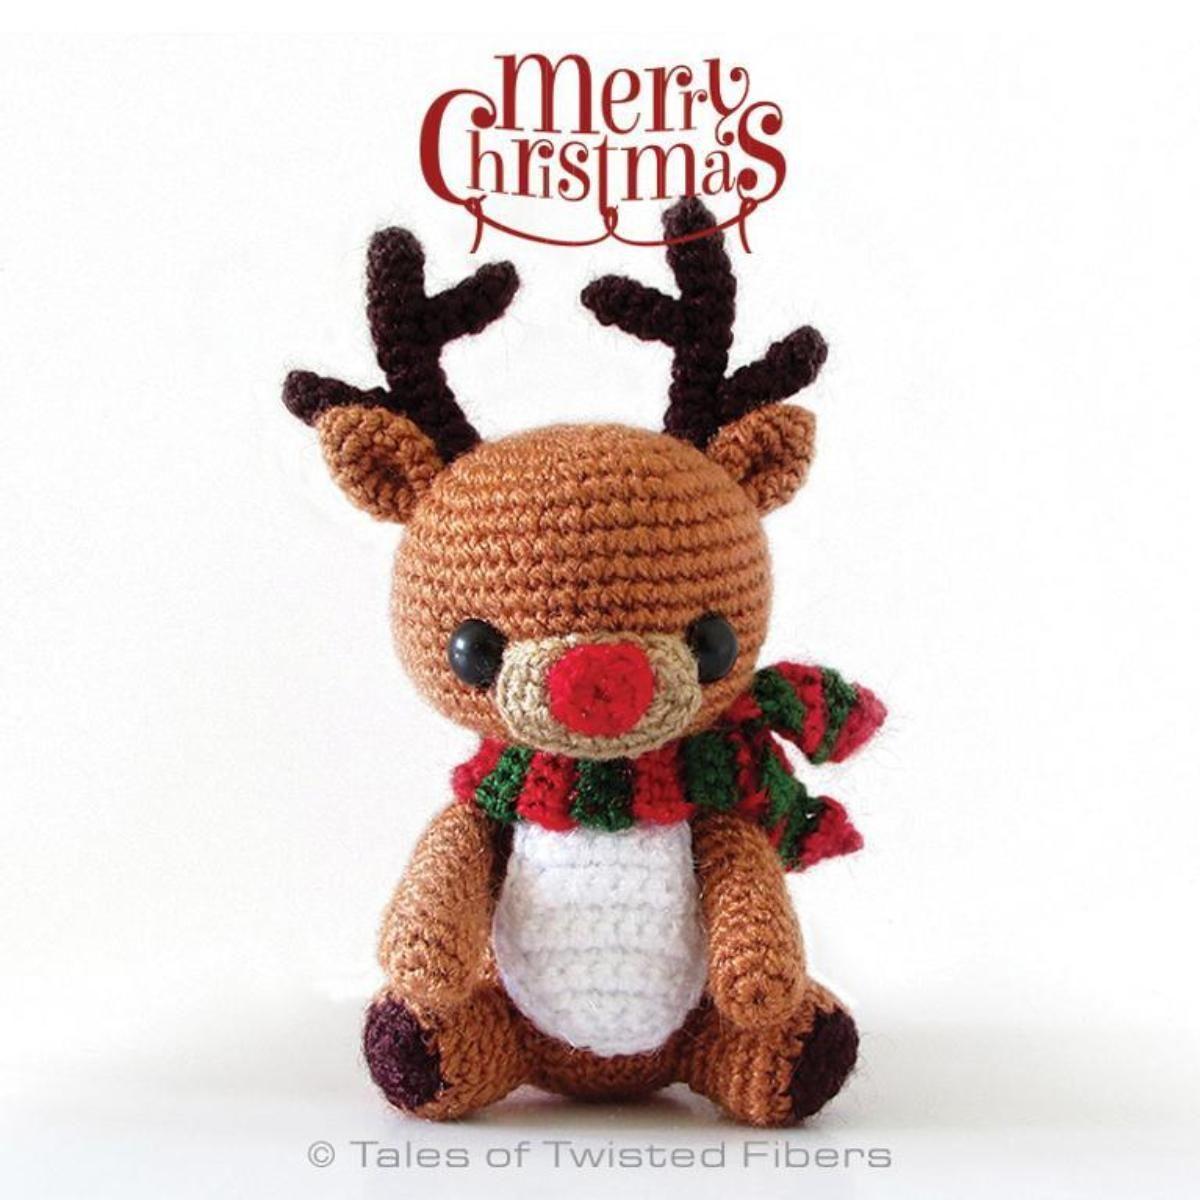 Rudy the reindeer crochet pinterest crochet crocheting rudolph the reindeer free amigurumi pattern pdf file bankloansurffo Choice Image